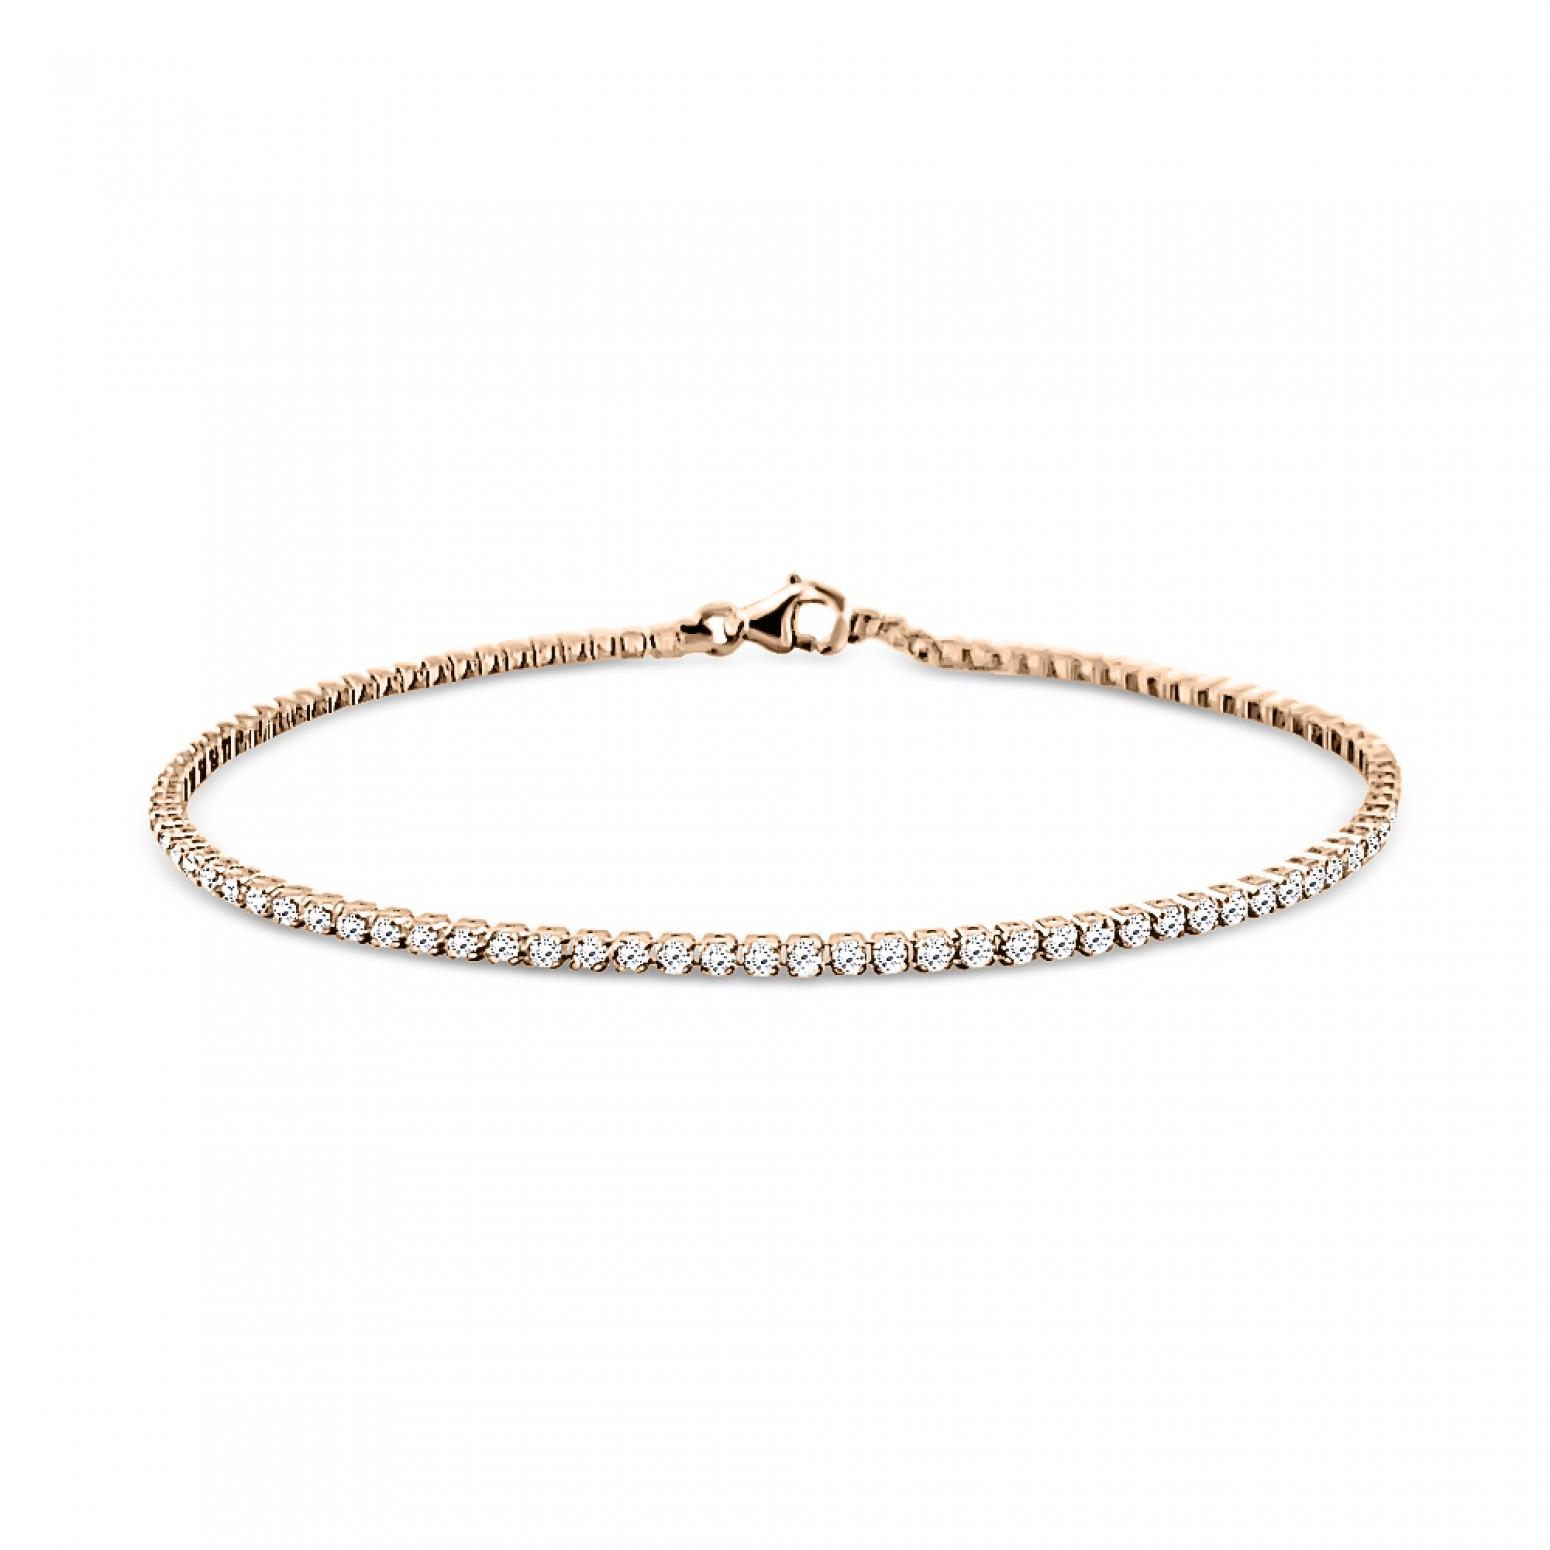 Tennis bracelet,14K pink gold with zircon, br2333 BRACELETS Κοσμηματα - chrilia.gr